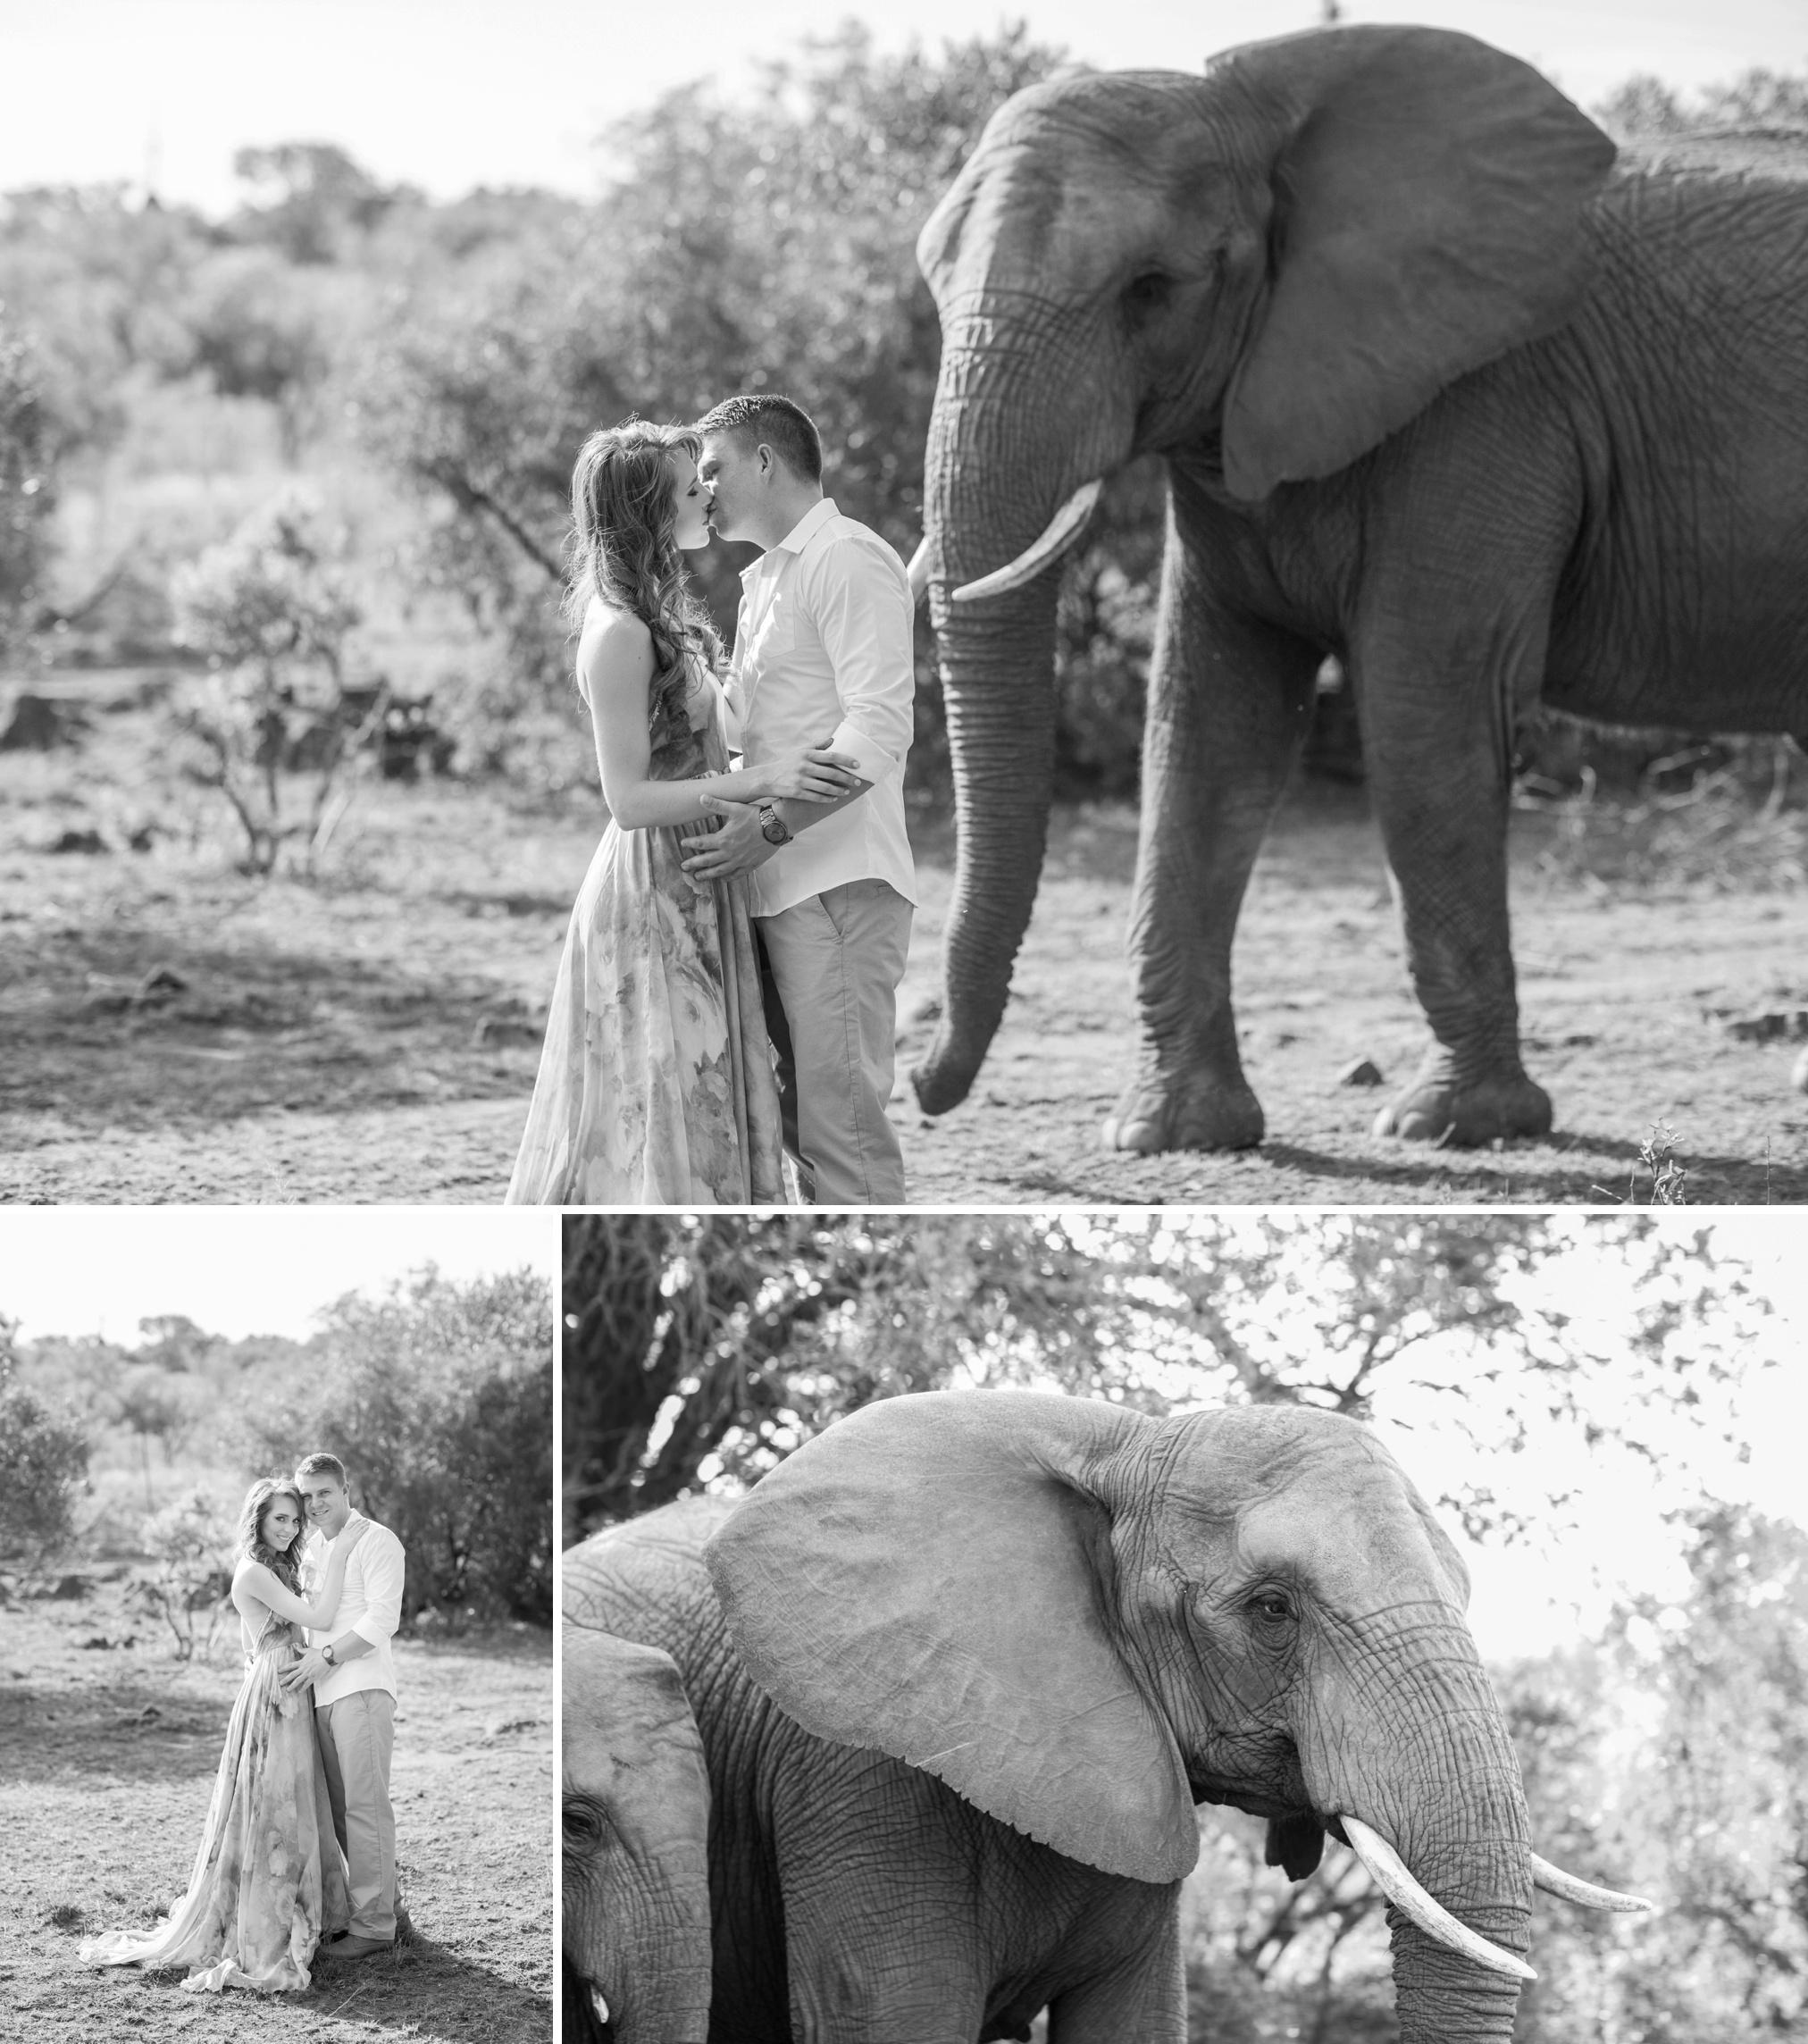 Glen_Afric_Kyle_and_Lindsay_engagement_elephants_safari_8